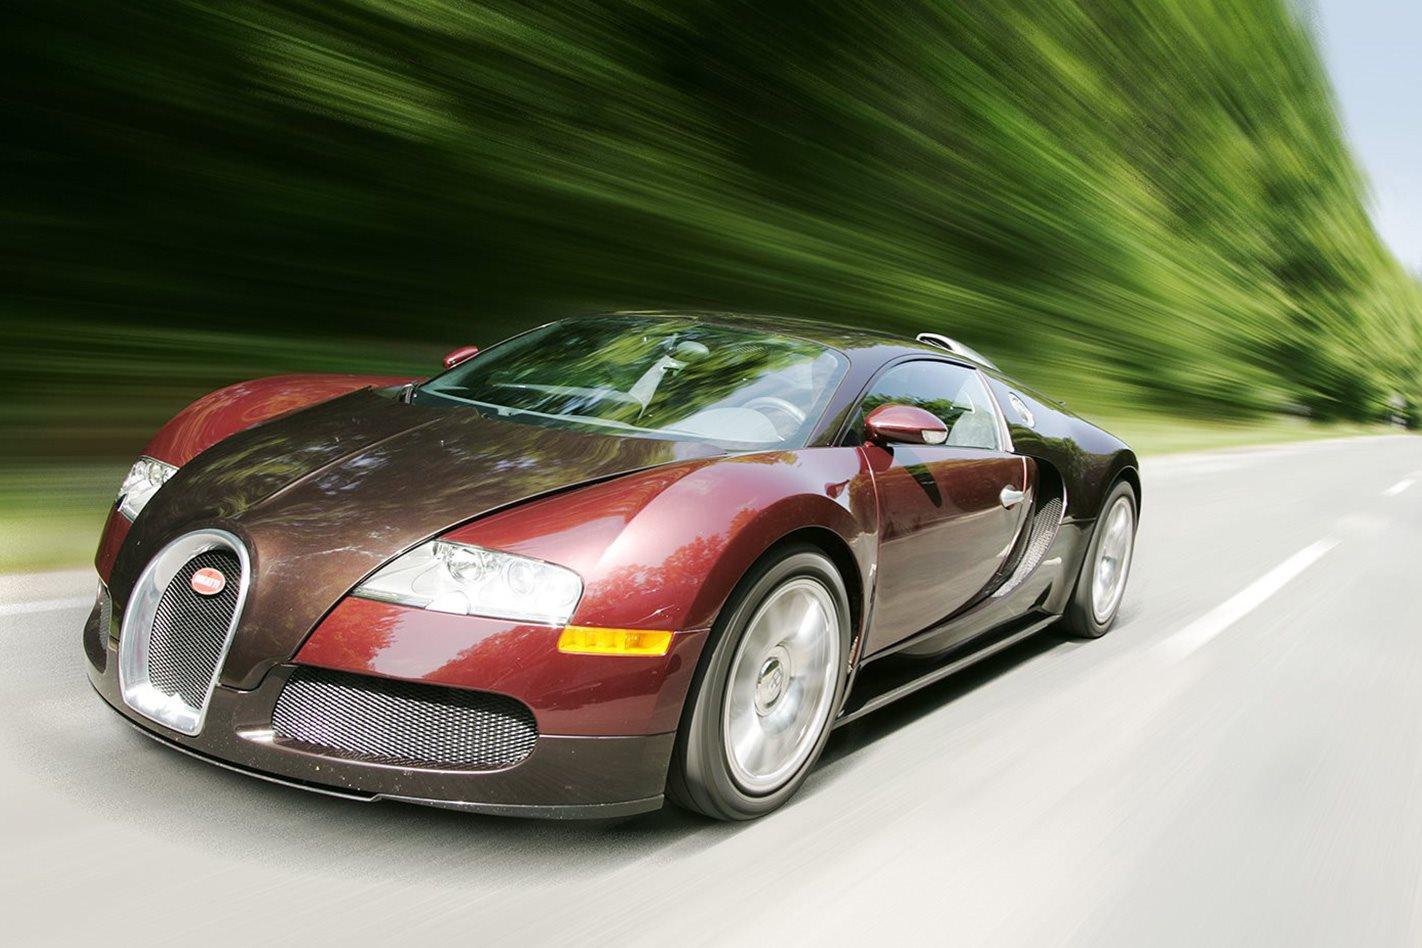 Here's what happens when you crash a Bugatti at 400km/h